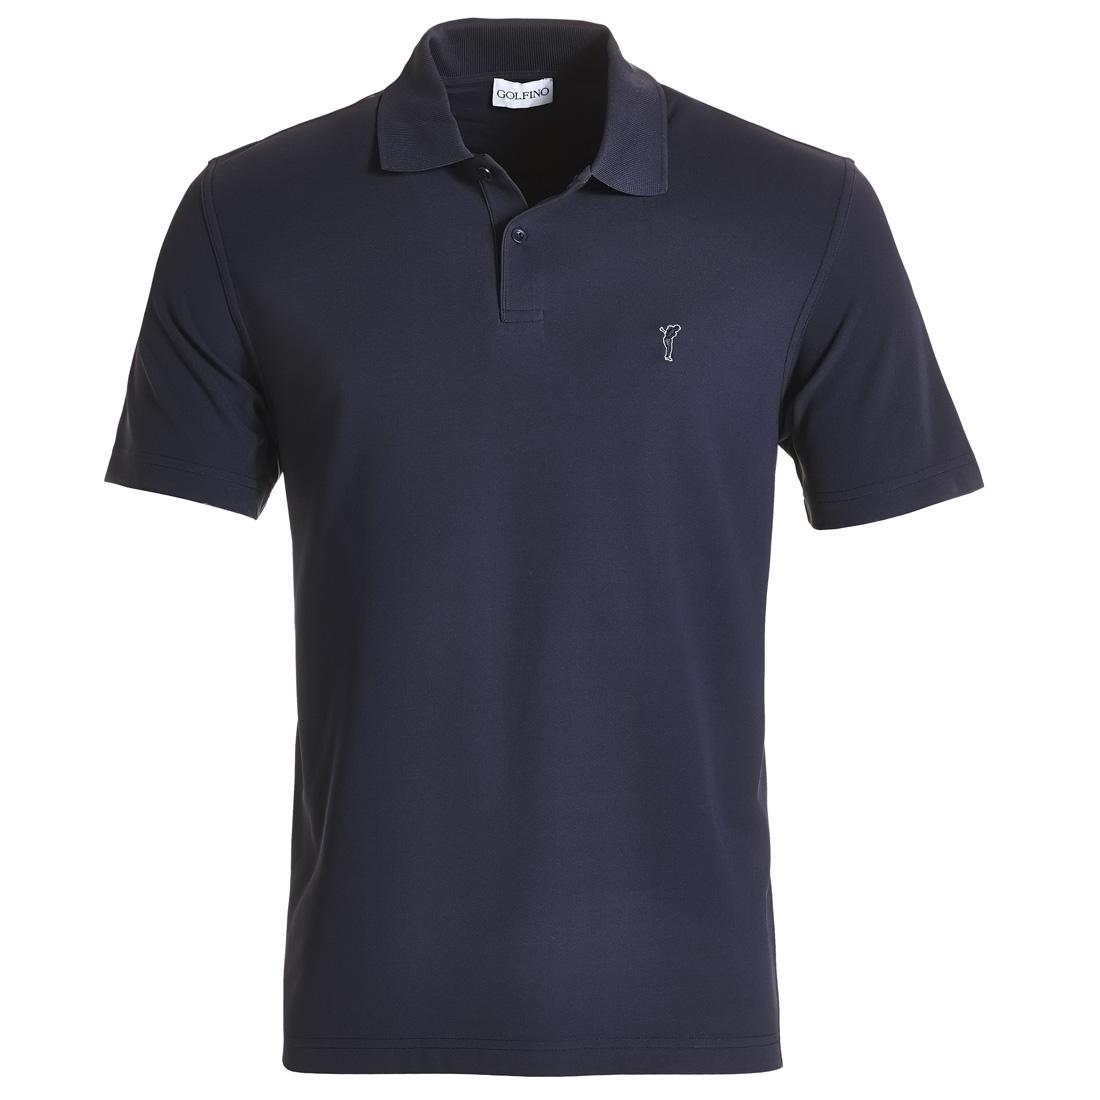 Men's polo shirt made from moisture-regulating material